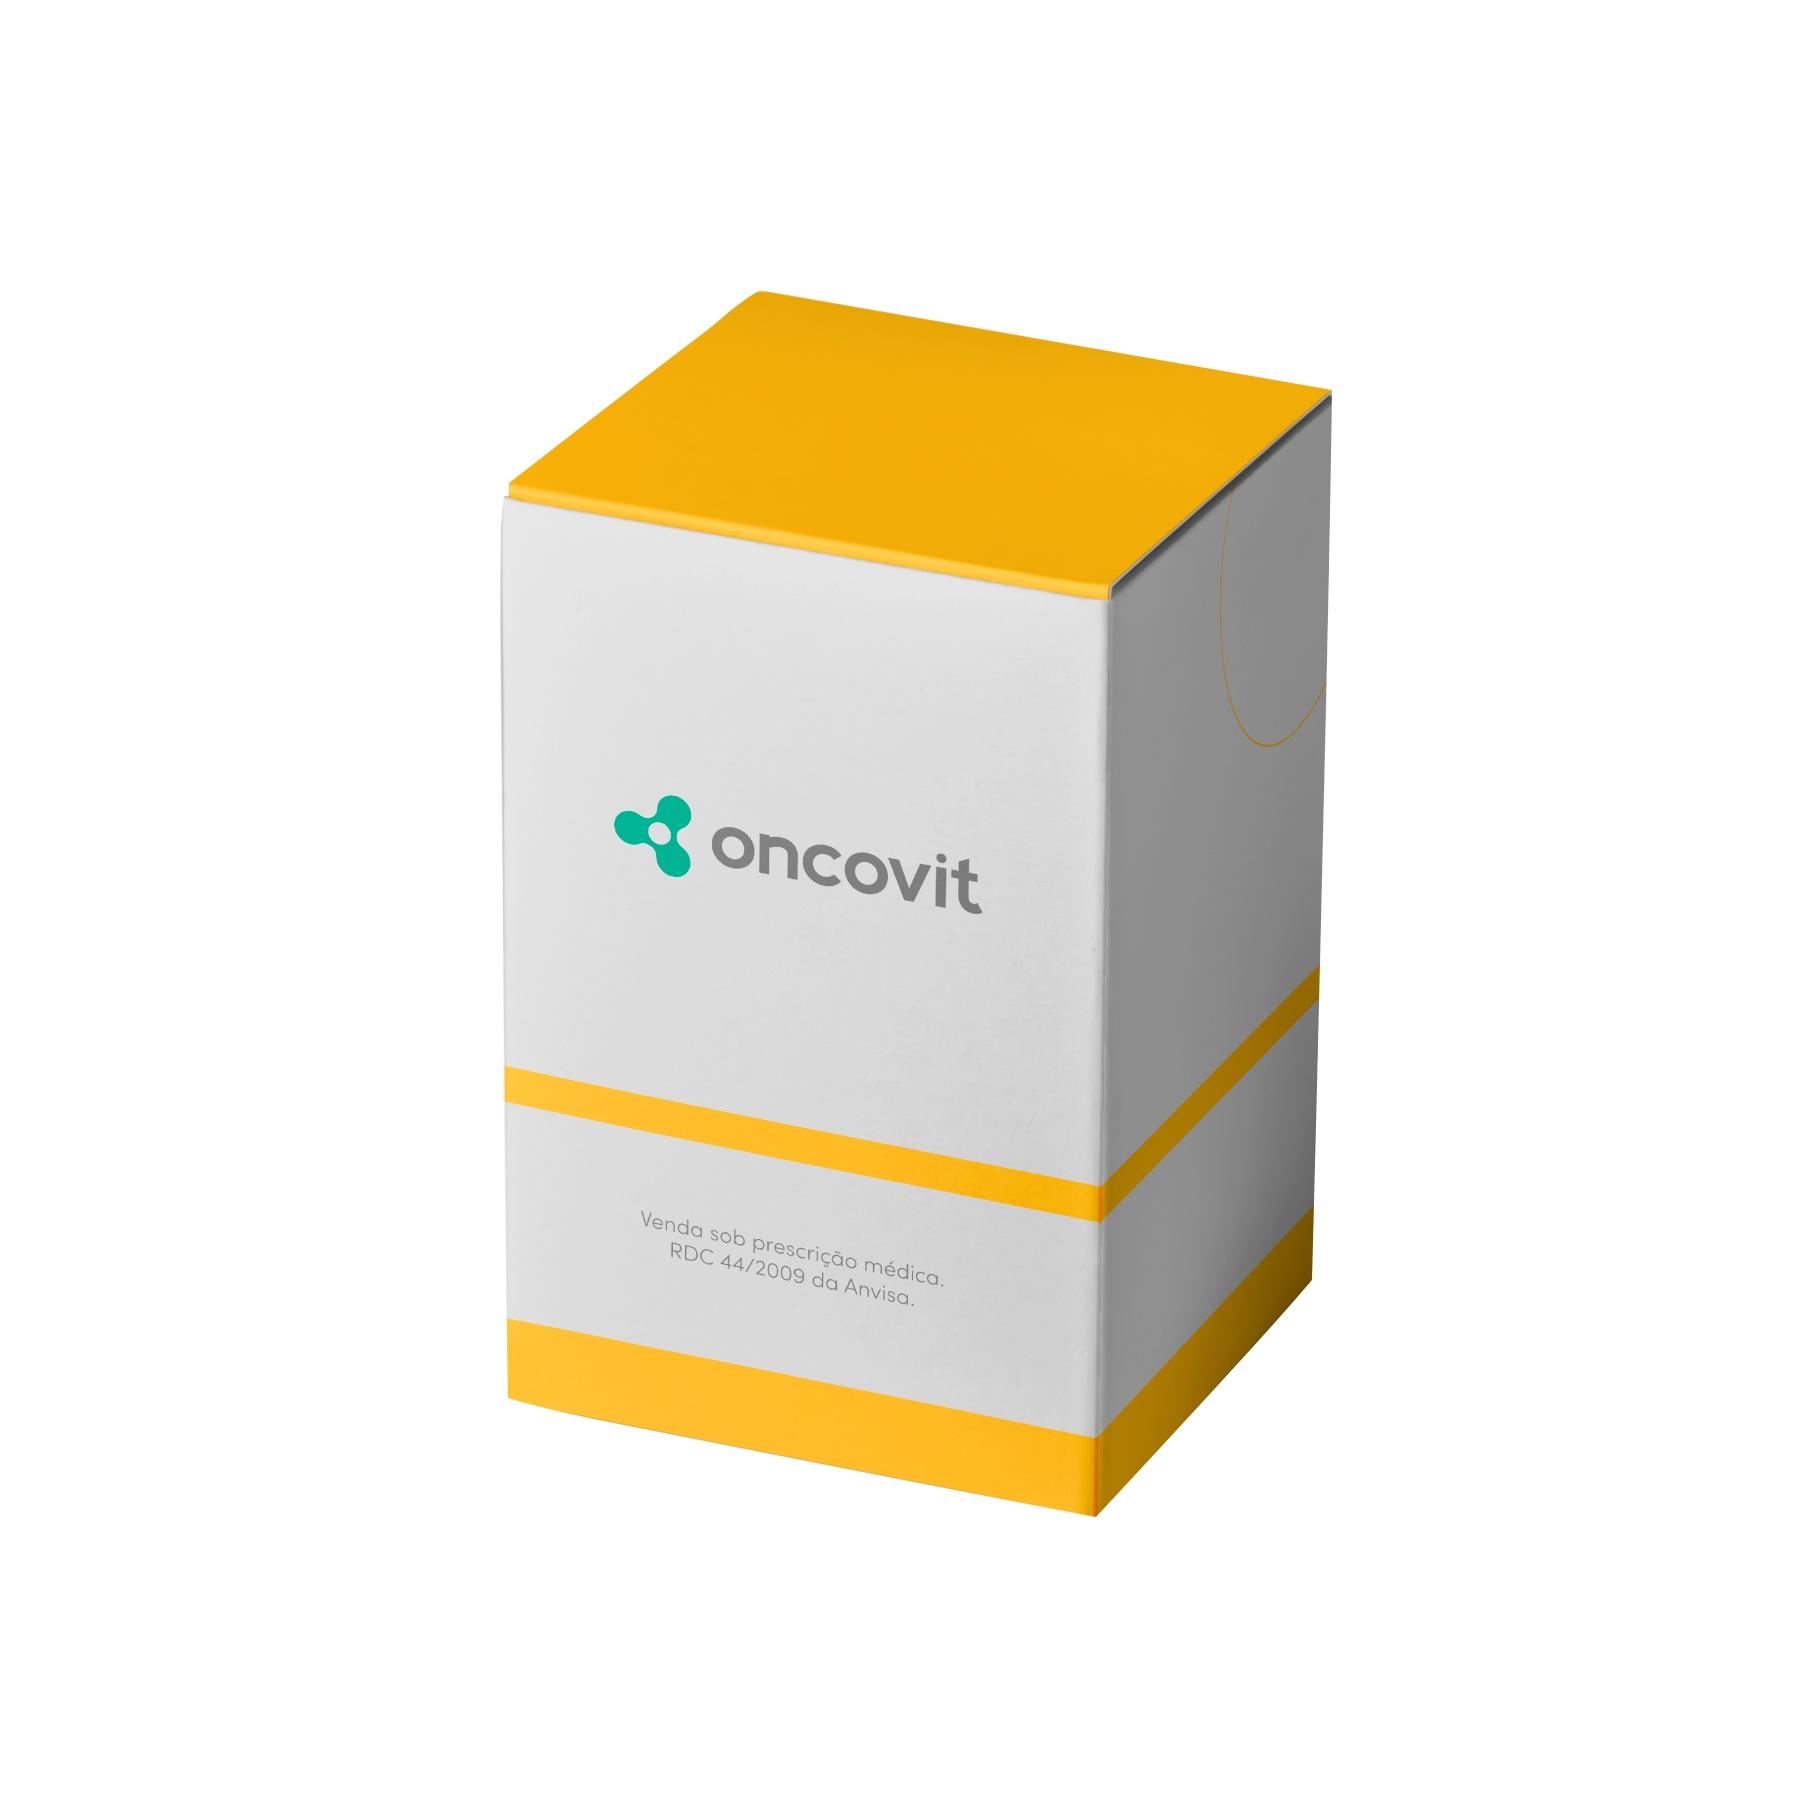 Mesilato de Imatinibe 400mg caixa com 30 comprimidos revestidos